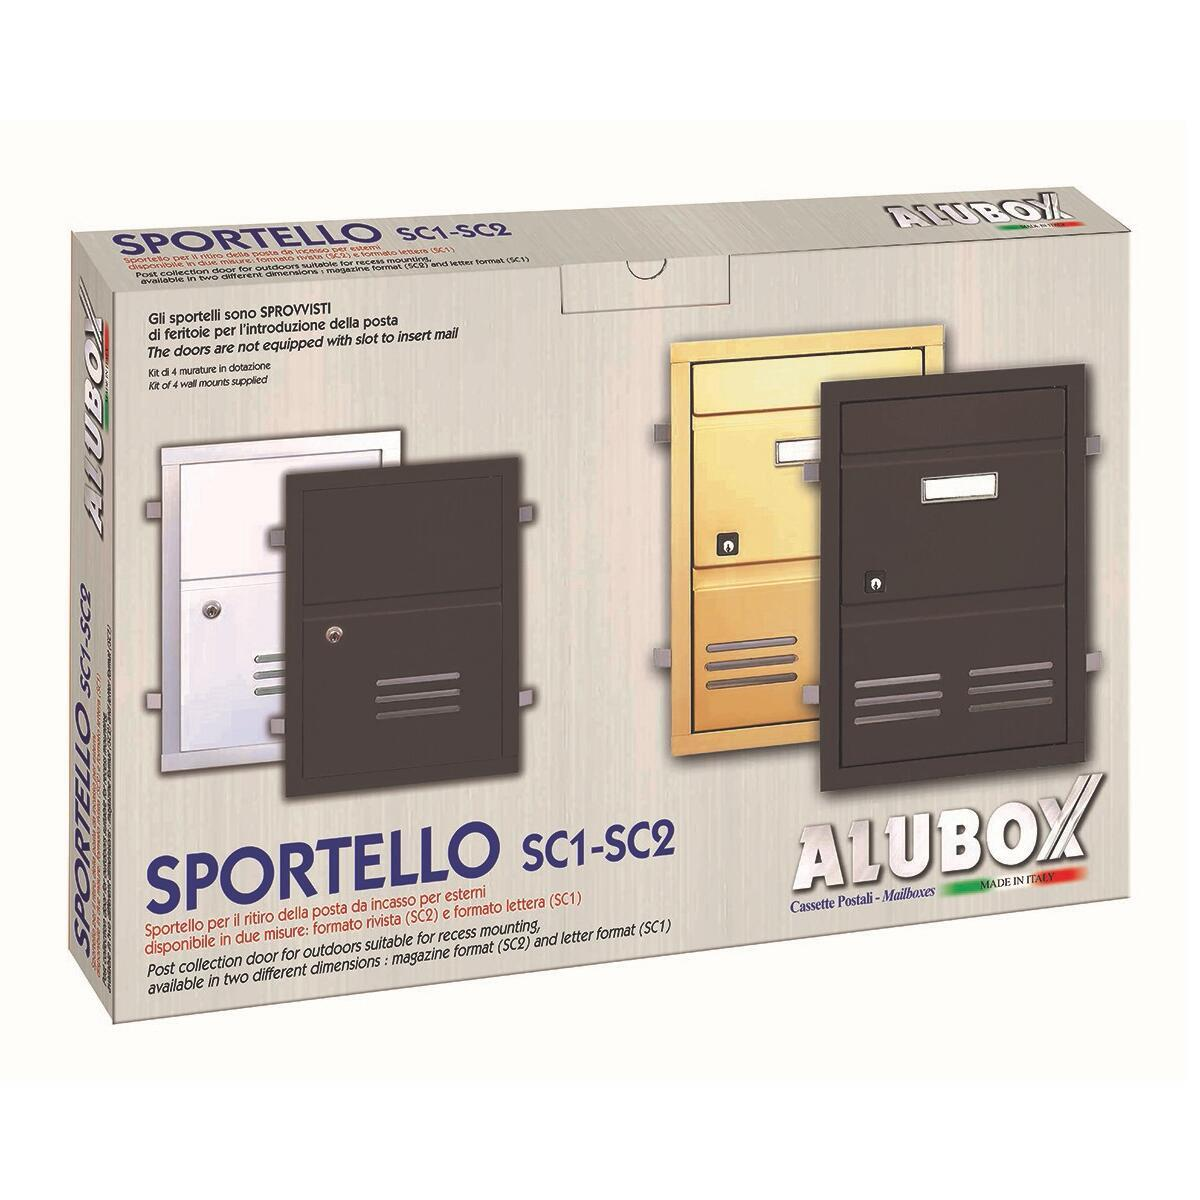 Sportello per cassetta postale ALUBOX da incasso in ghisa L 29 x H 40 cm - 2